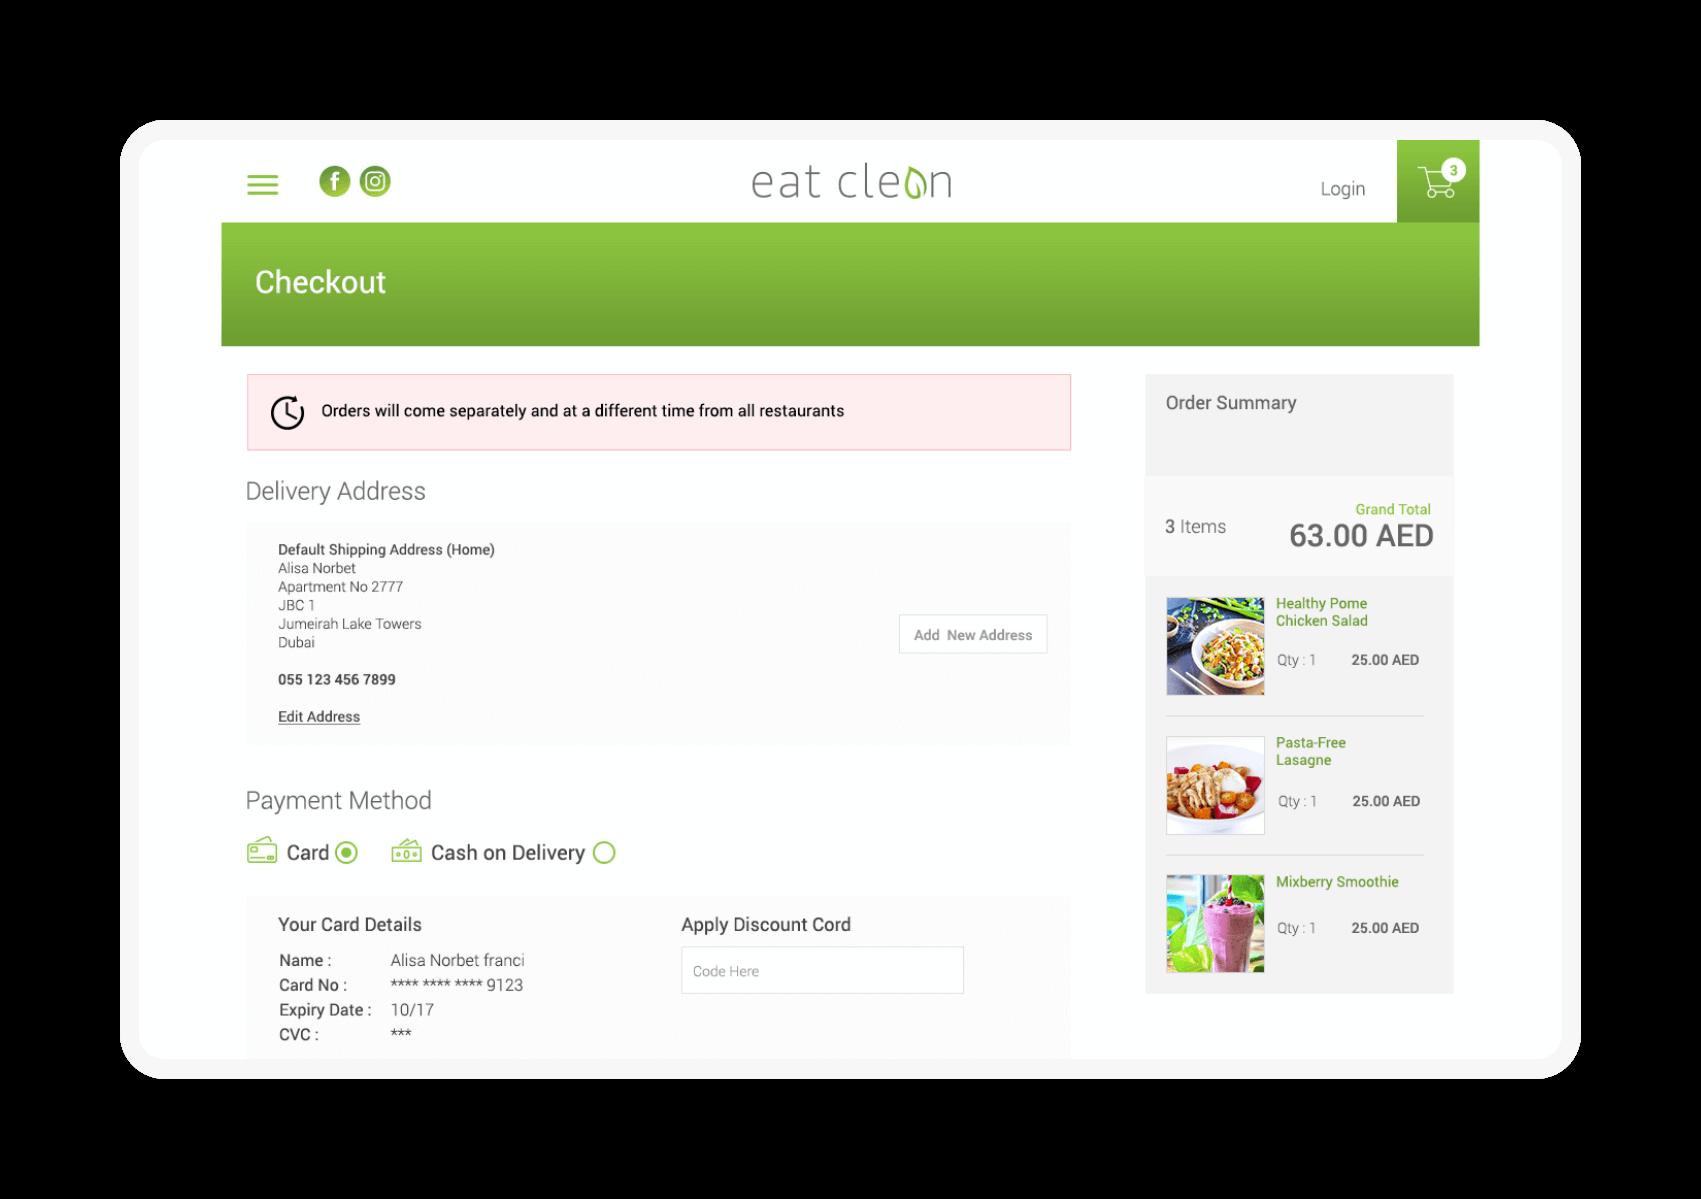 Eatclean_D_008.png